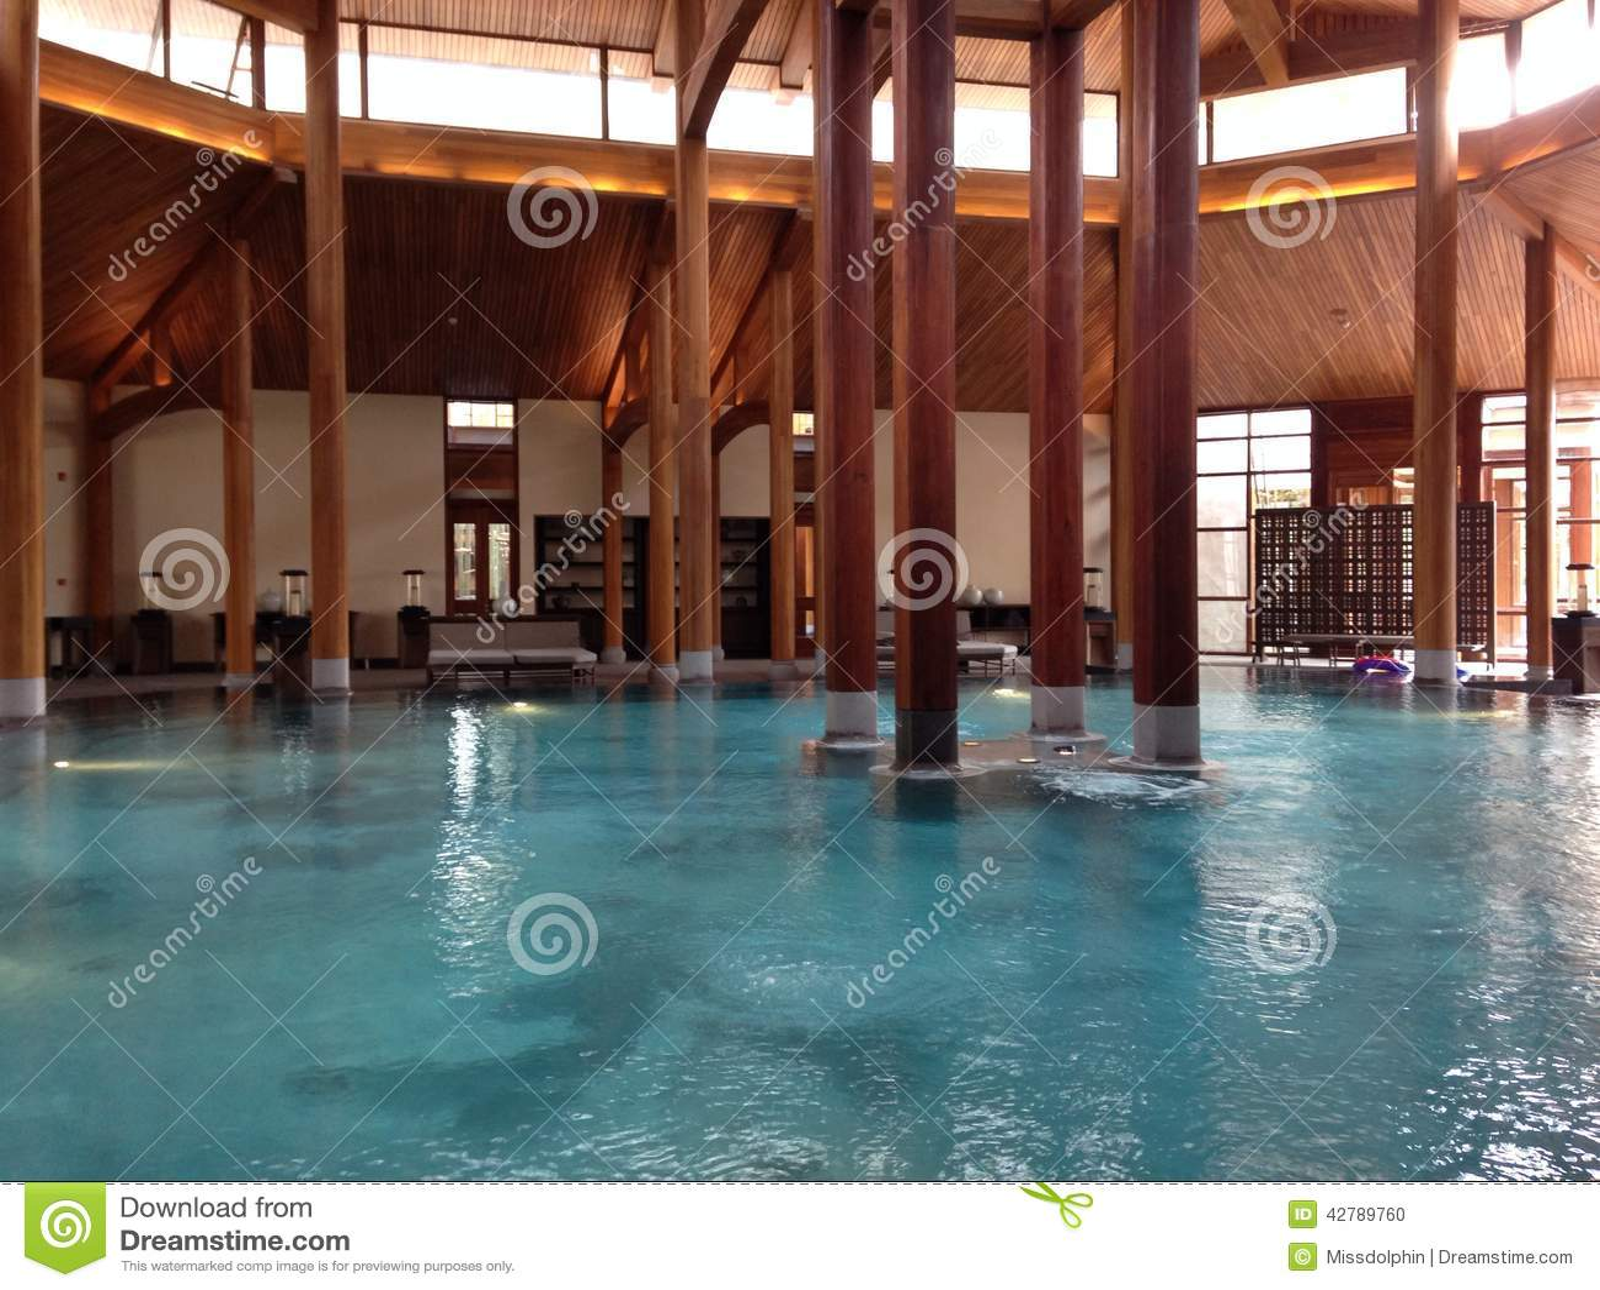 Indoor Pillars swimming pool indoor with wood pillars stock photo - image: 42789760